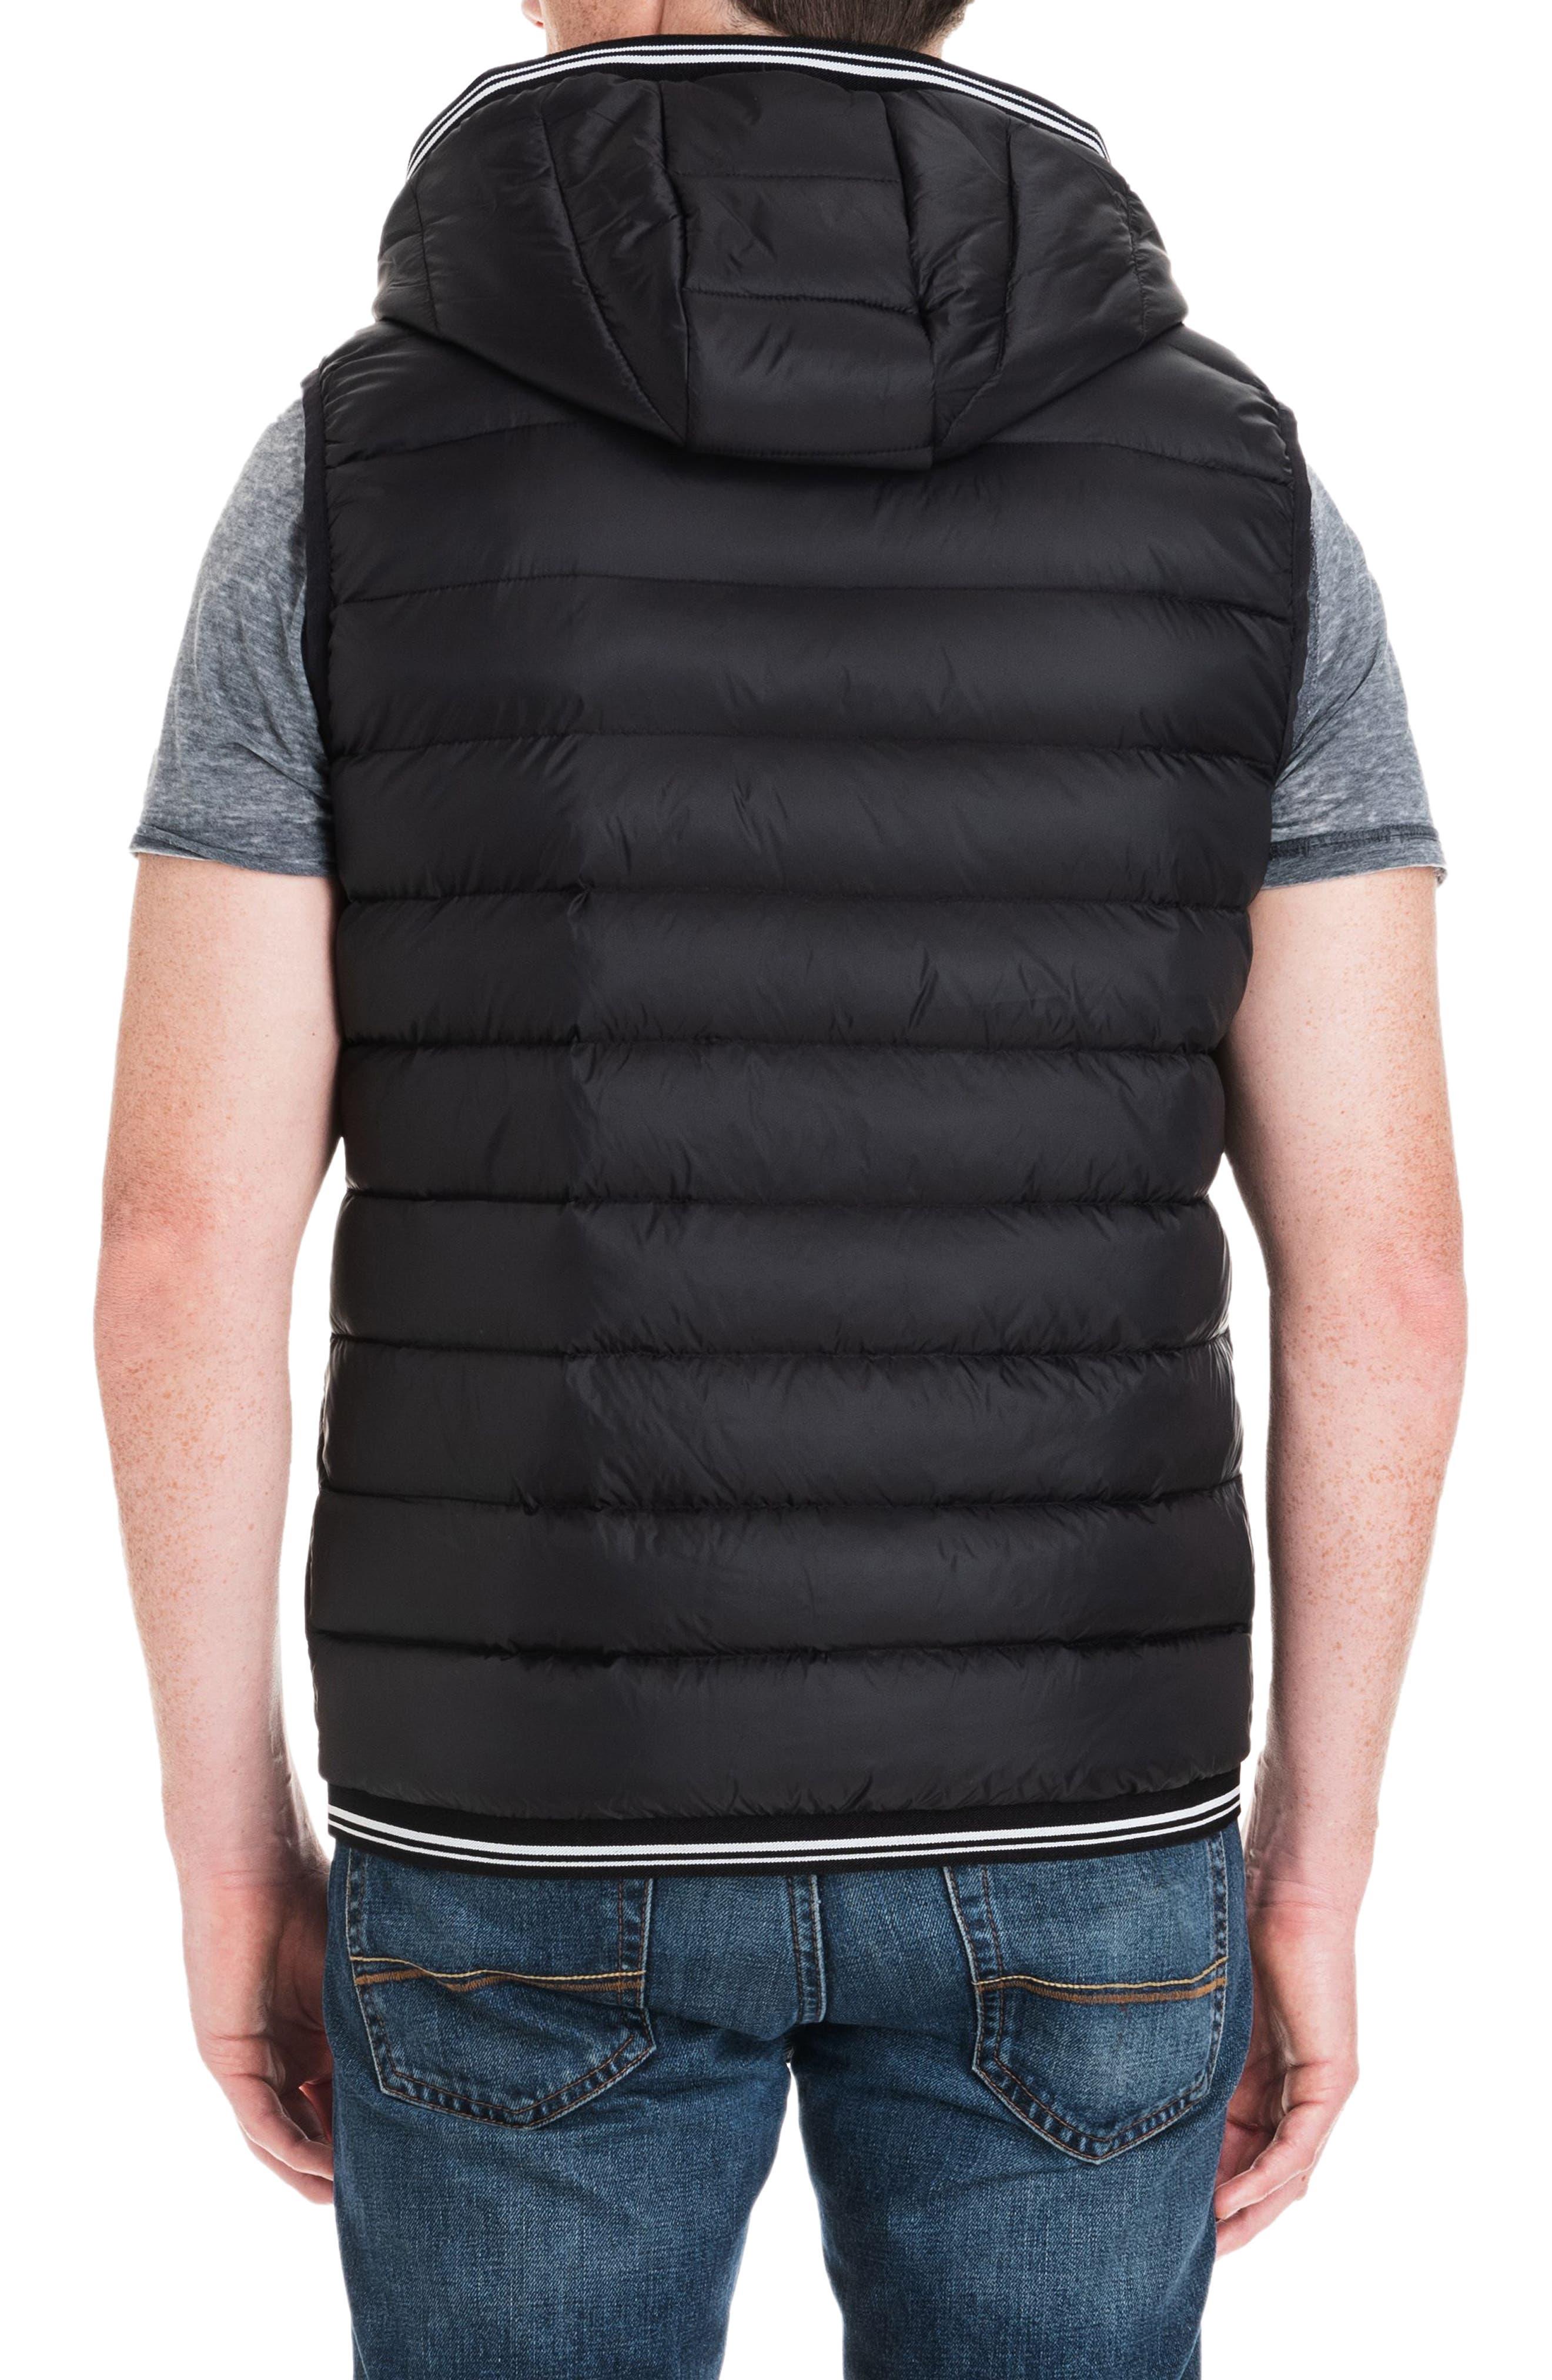 Locke Hooded Quilted Vest,                             Alternate thumbnail 2, color,                             BLACK